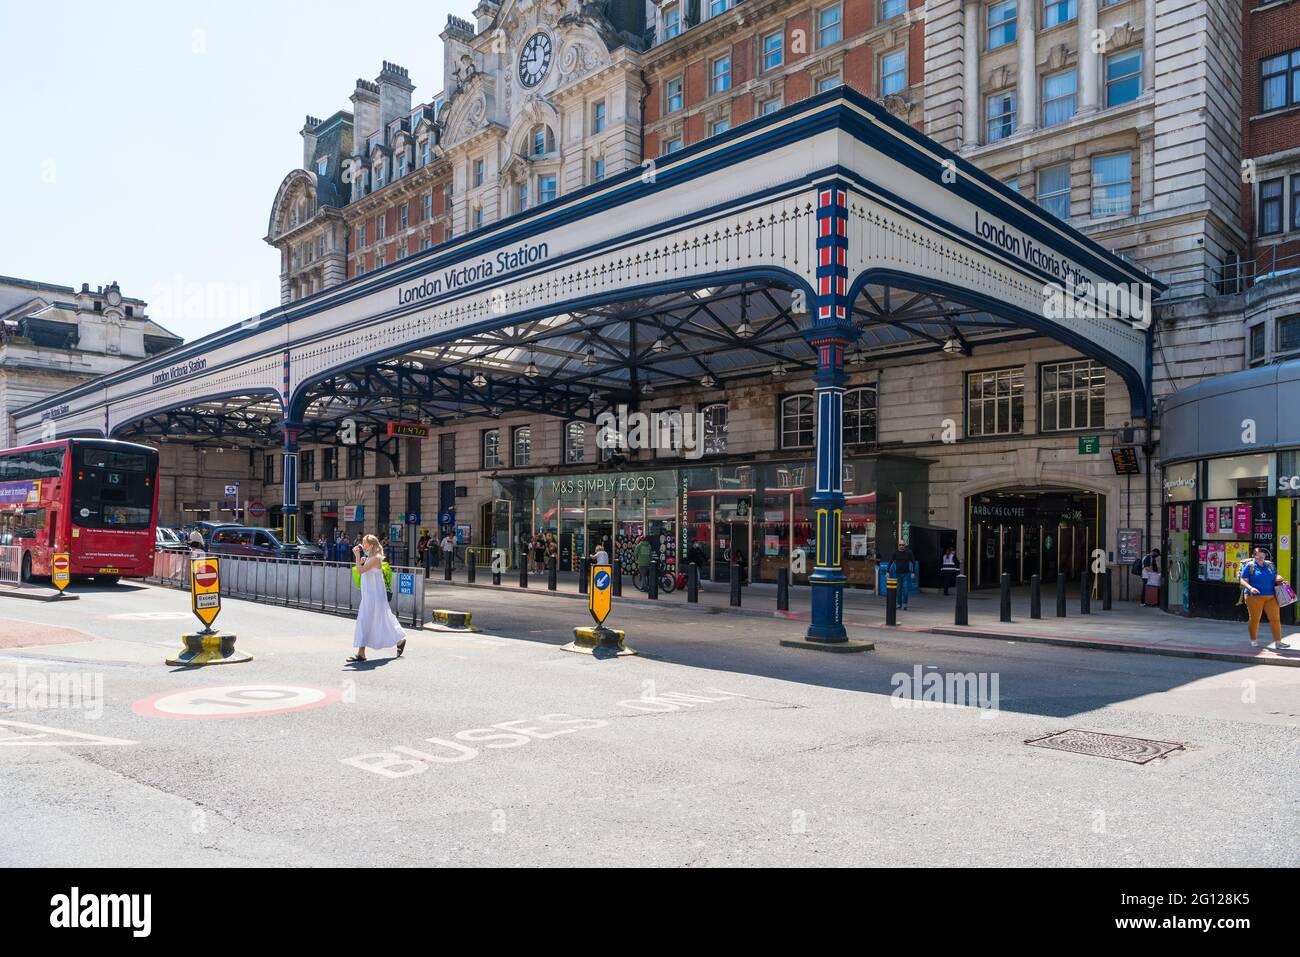 London Victoria railway station in Terminus Place, London, England, UK Stock Photo